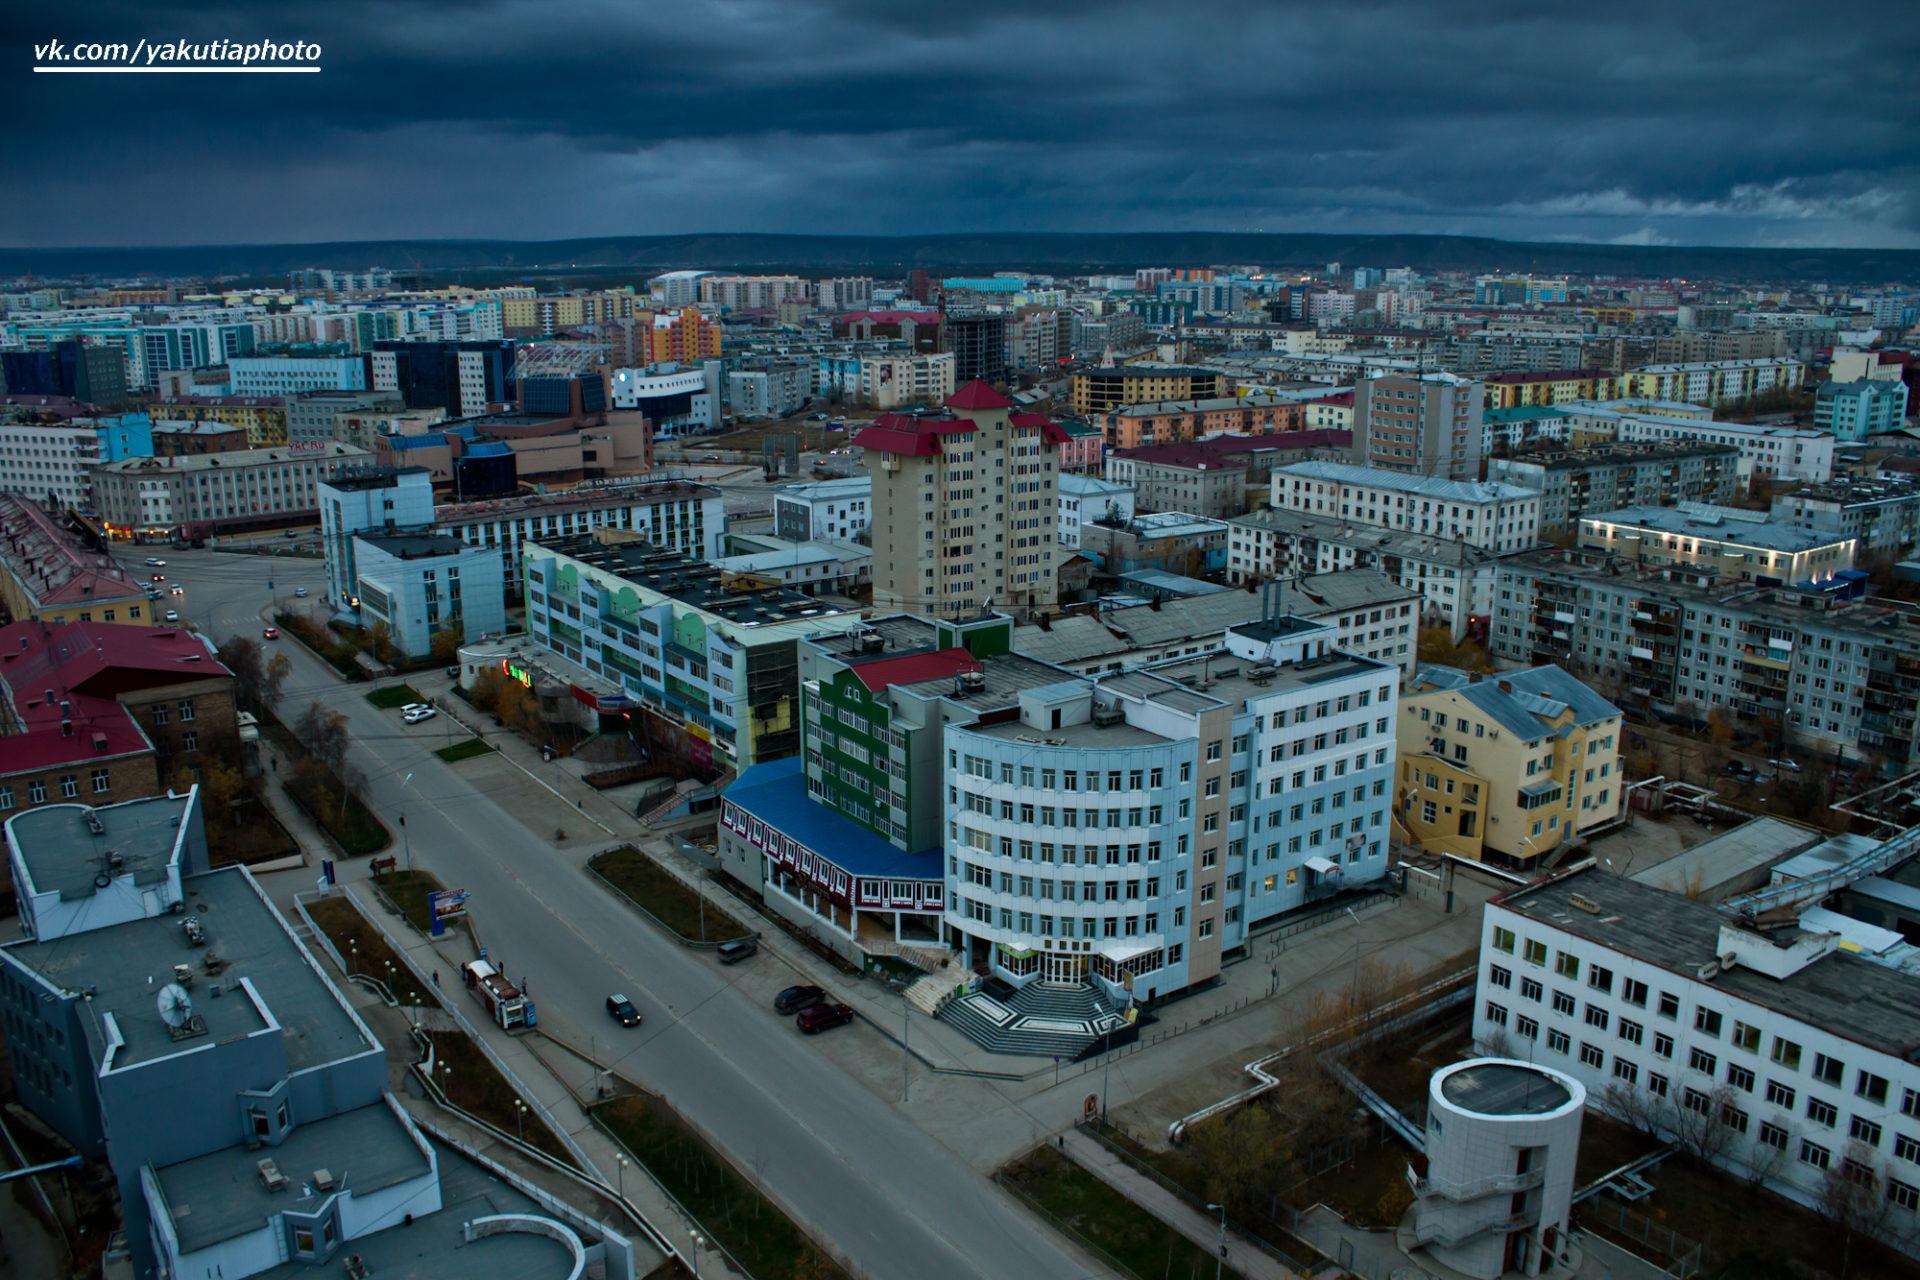 Депутаты Гордумы: школам Якутска не хватает финансовых средств